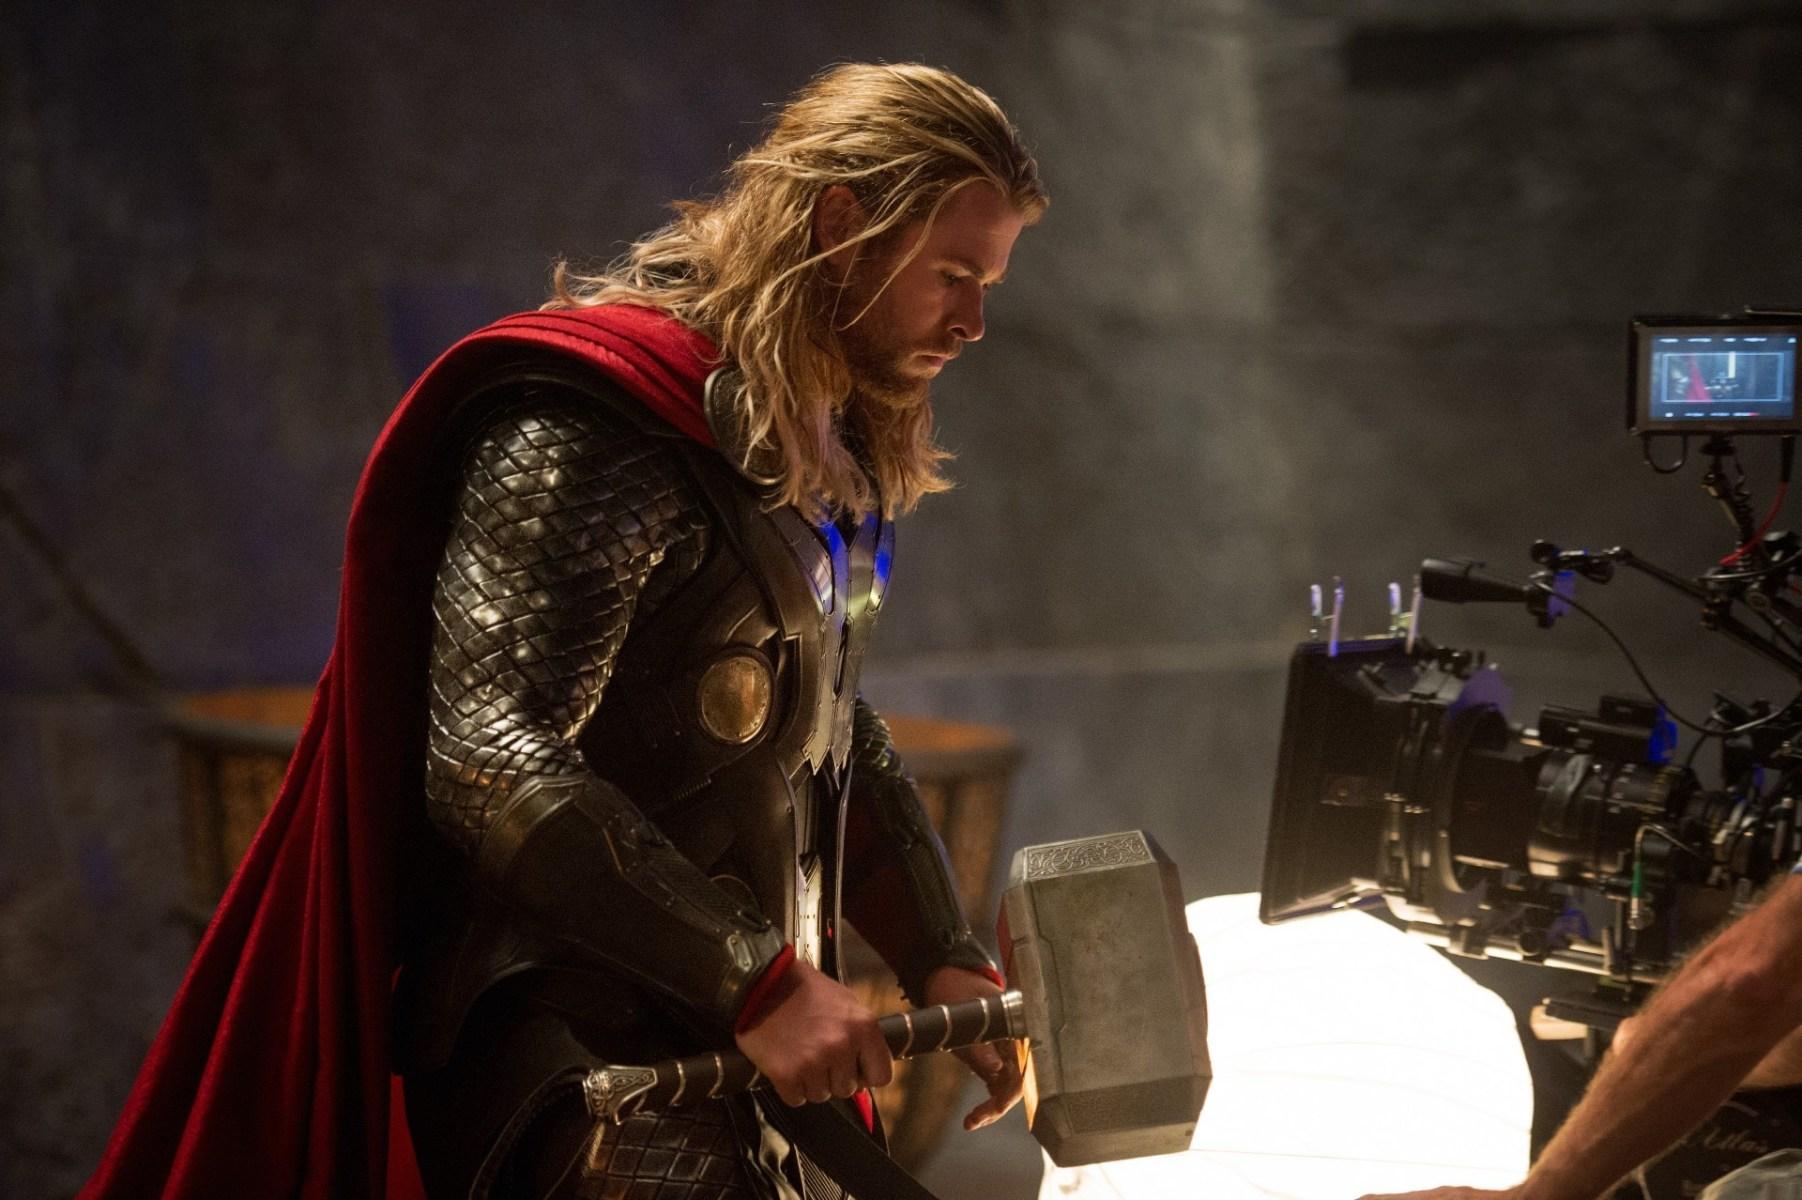 Thor: The Dark World (2013) Behind the Scenes